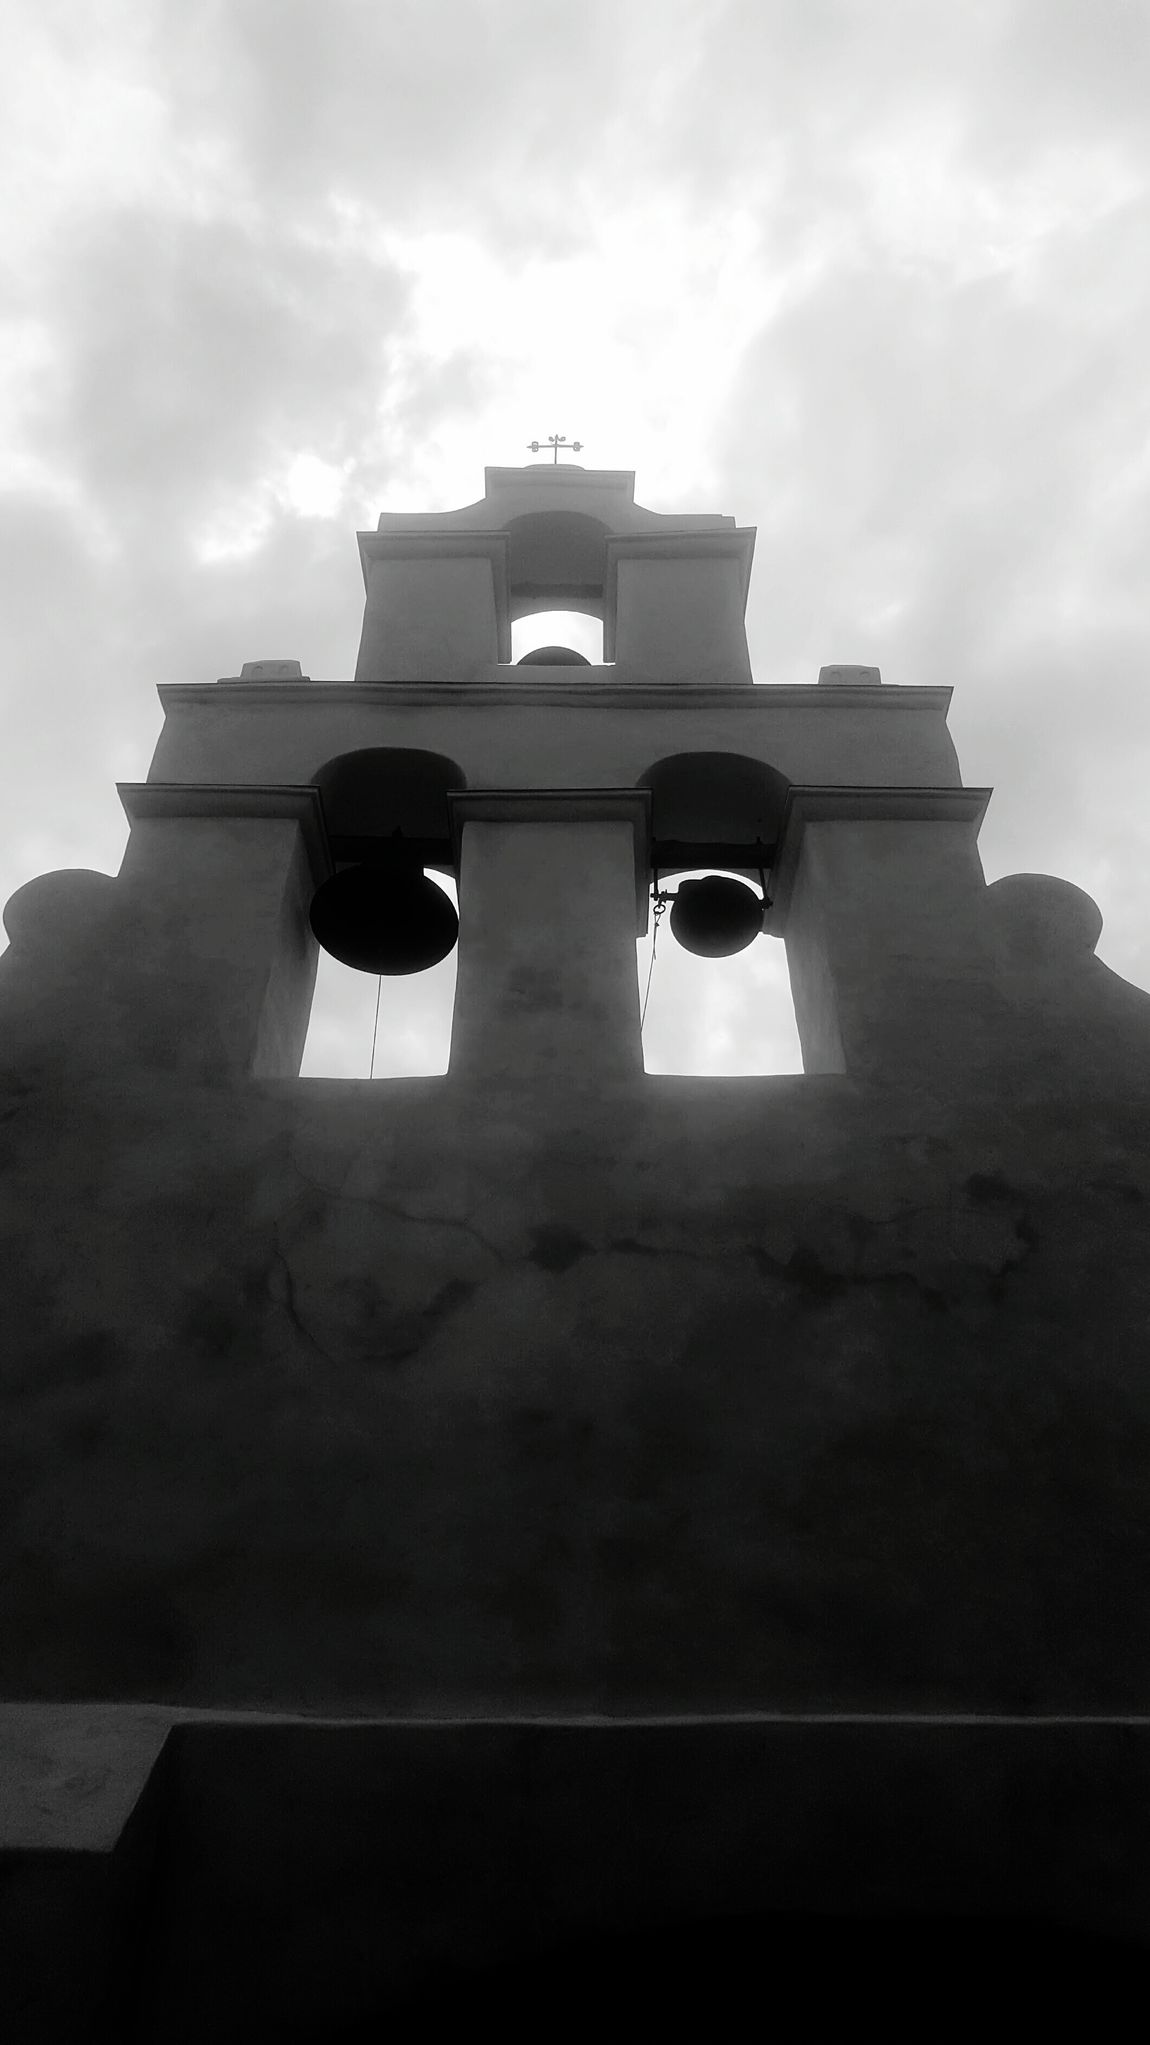 Misiones Mission Church Church Churchporn San Antonio Blackandwhite Black And White Photography EyeEm Gallery